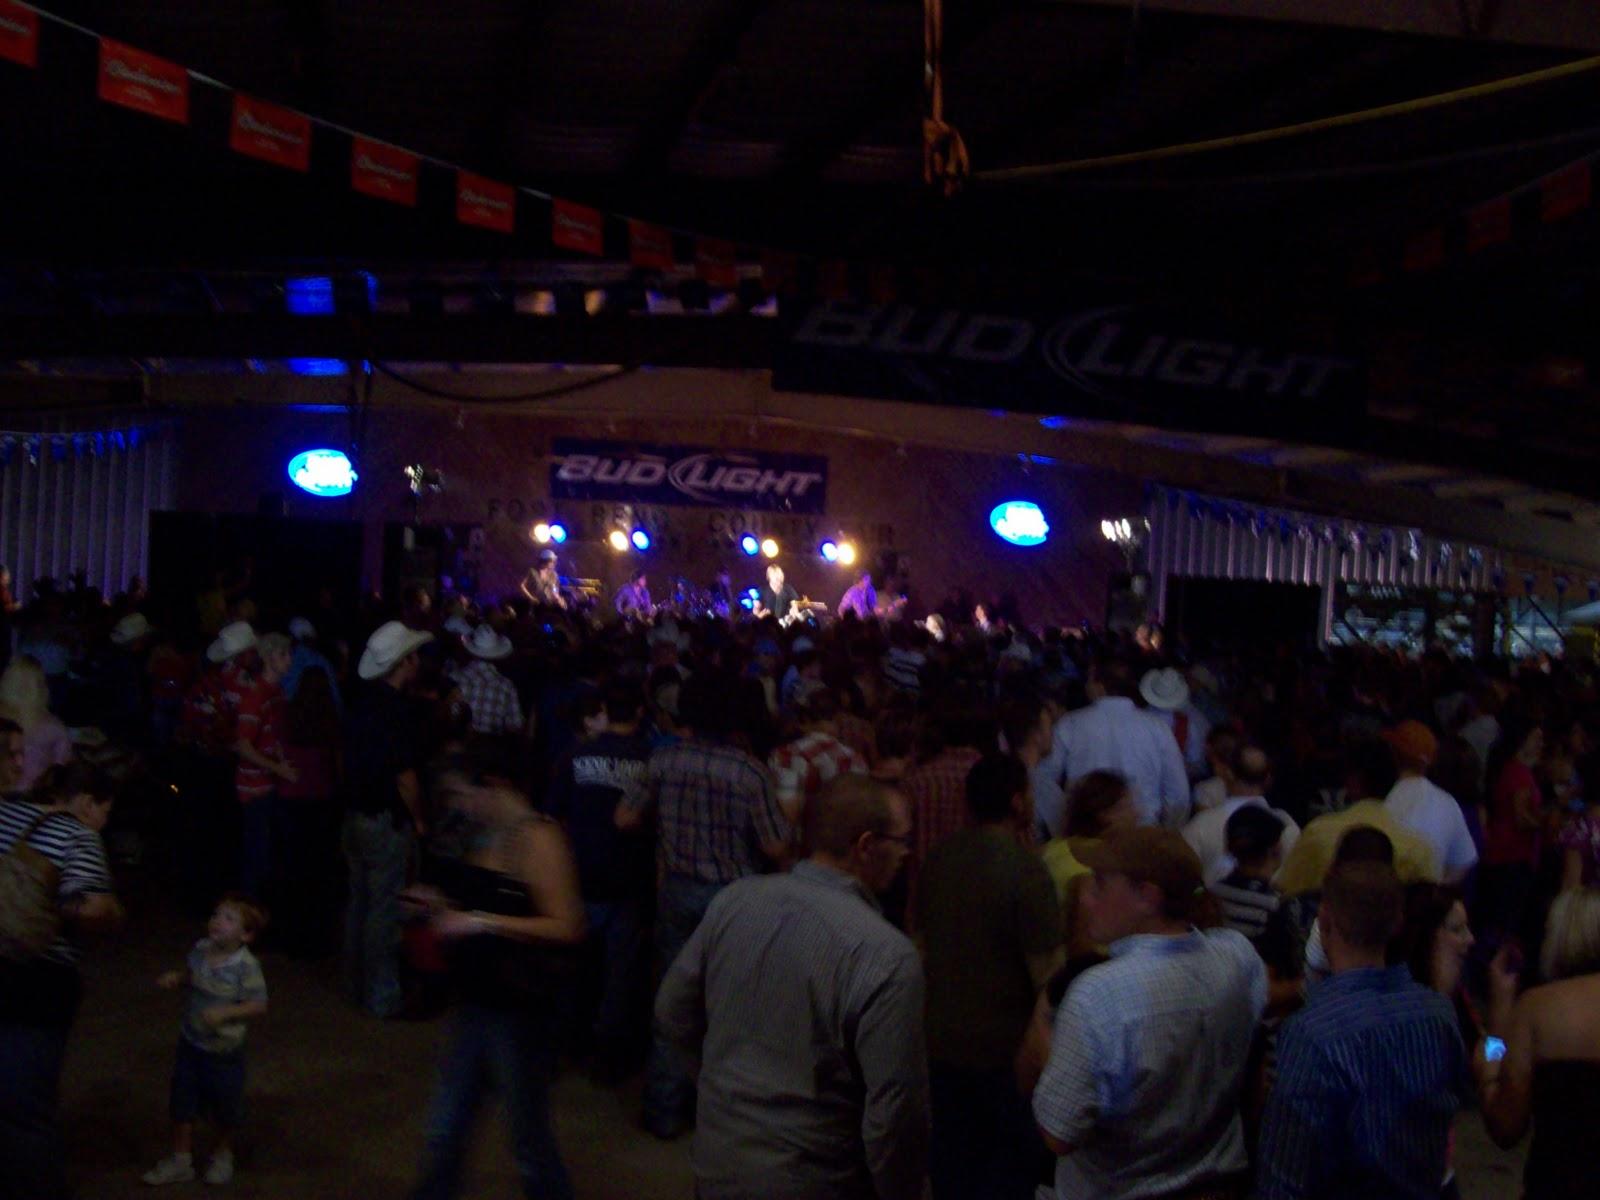 Fort Bend County Fair - 101_5469.JPG